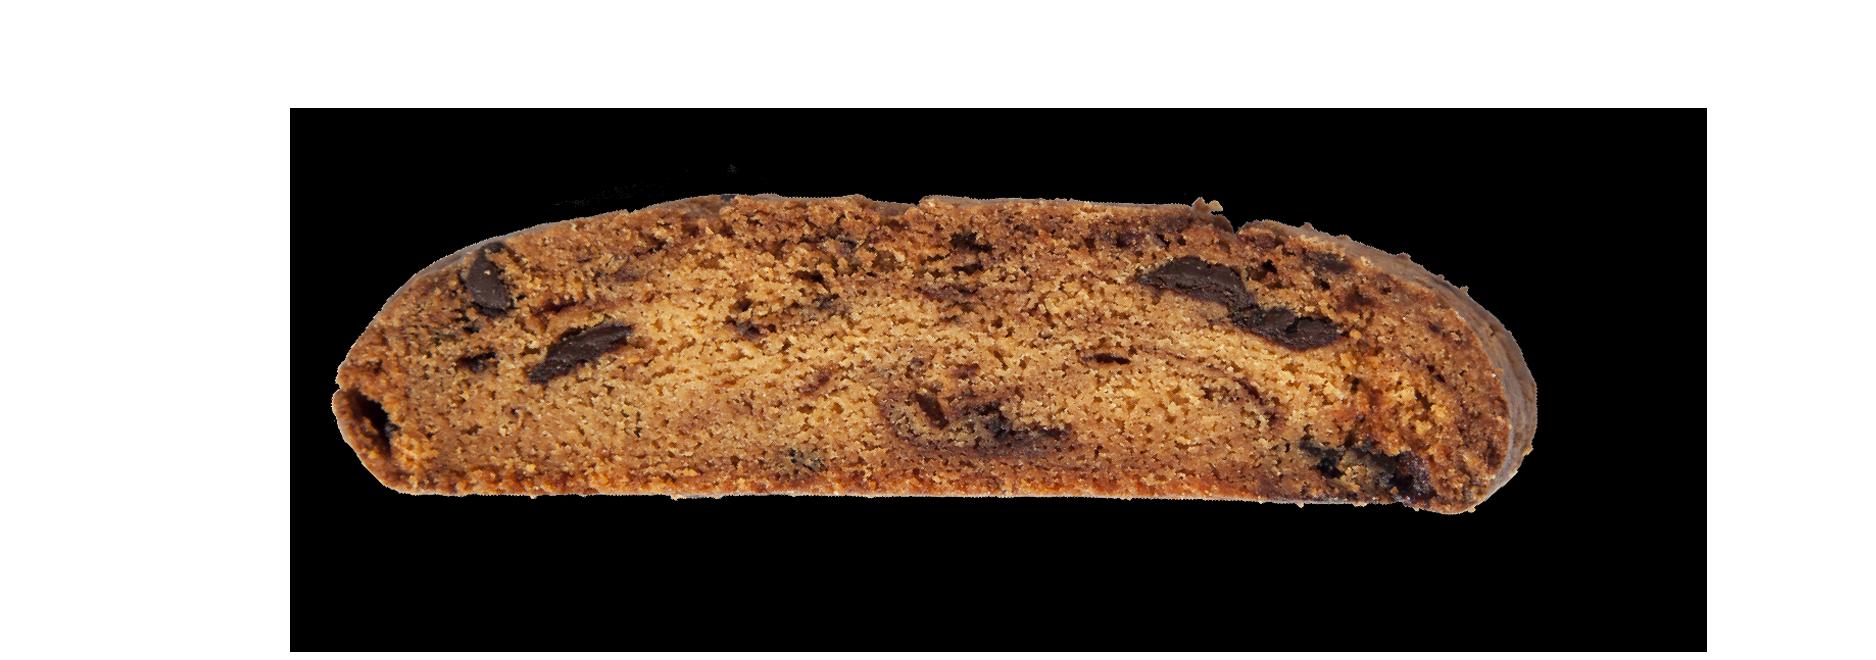 biscotti heath choco chip.png